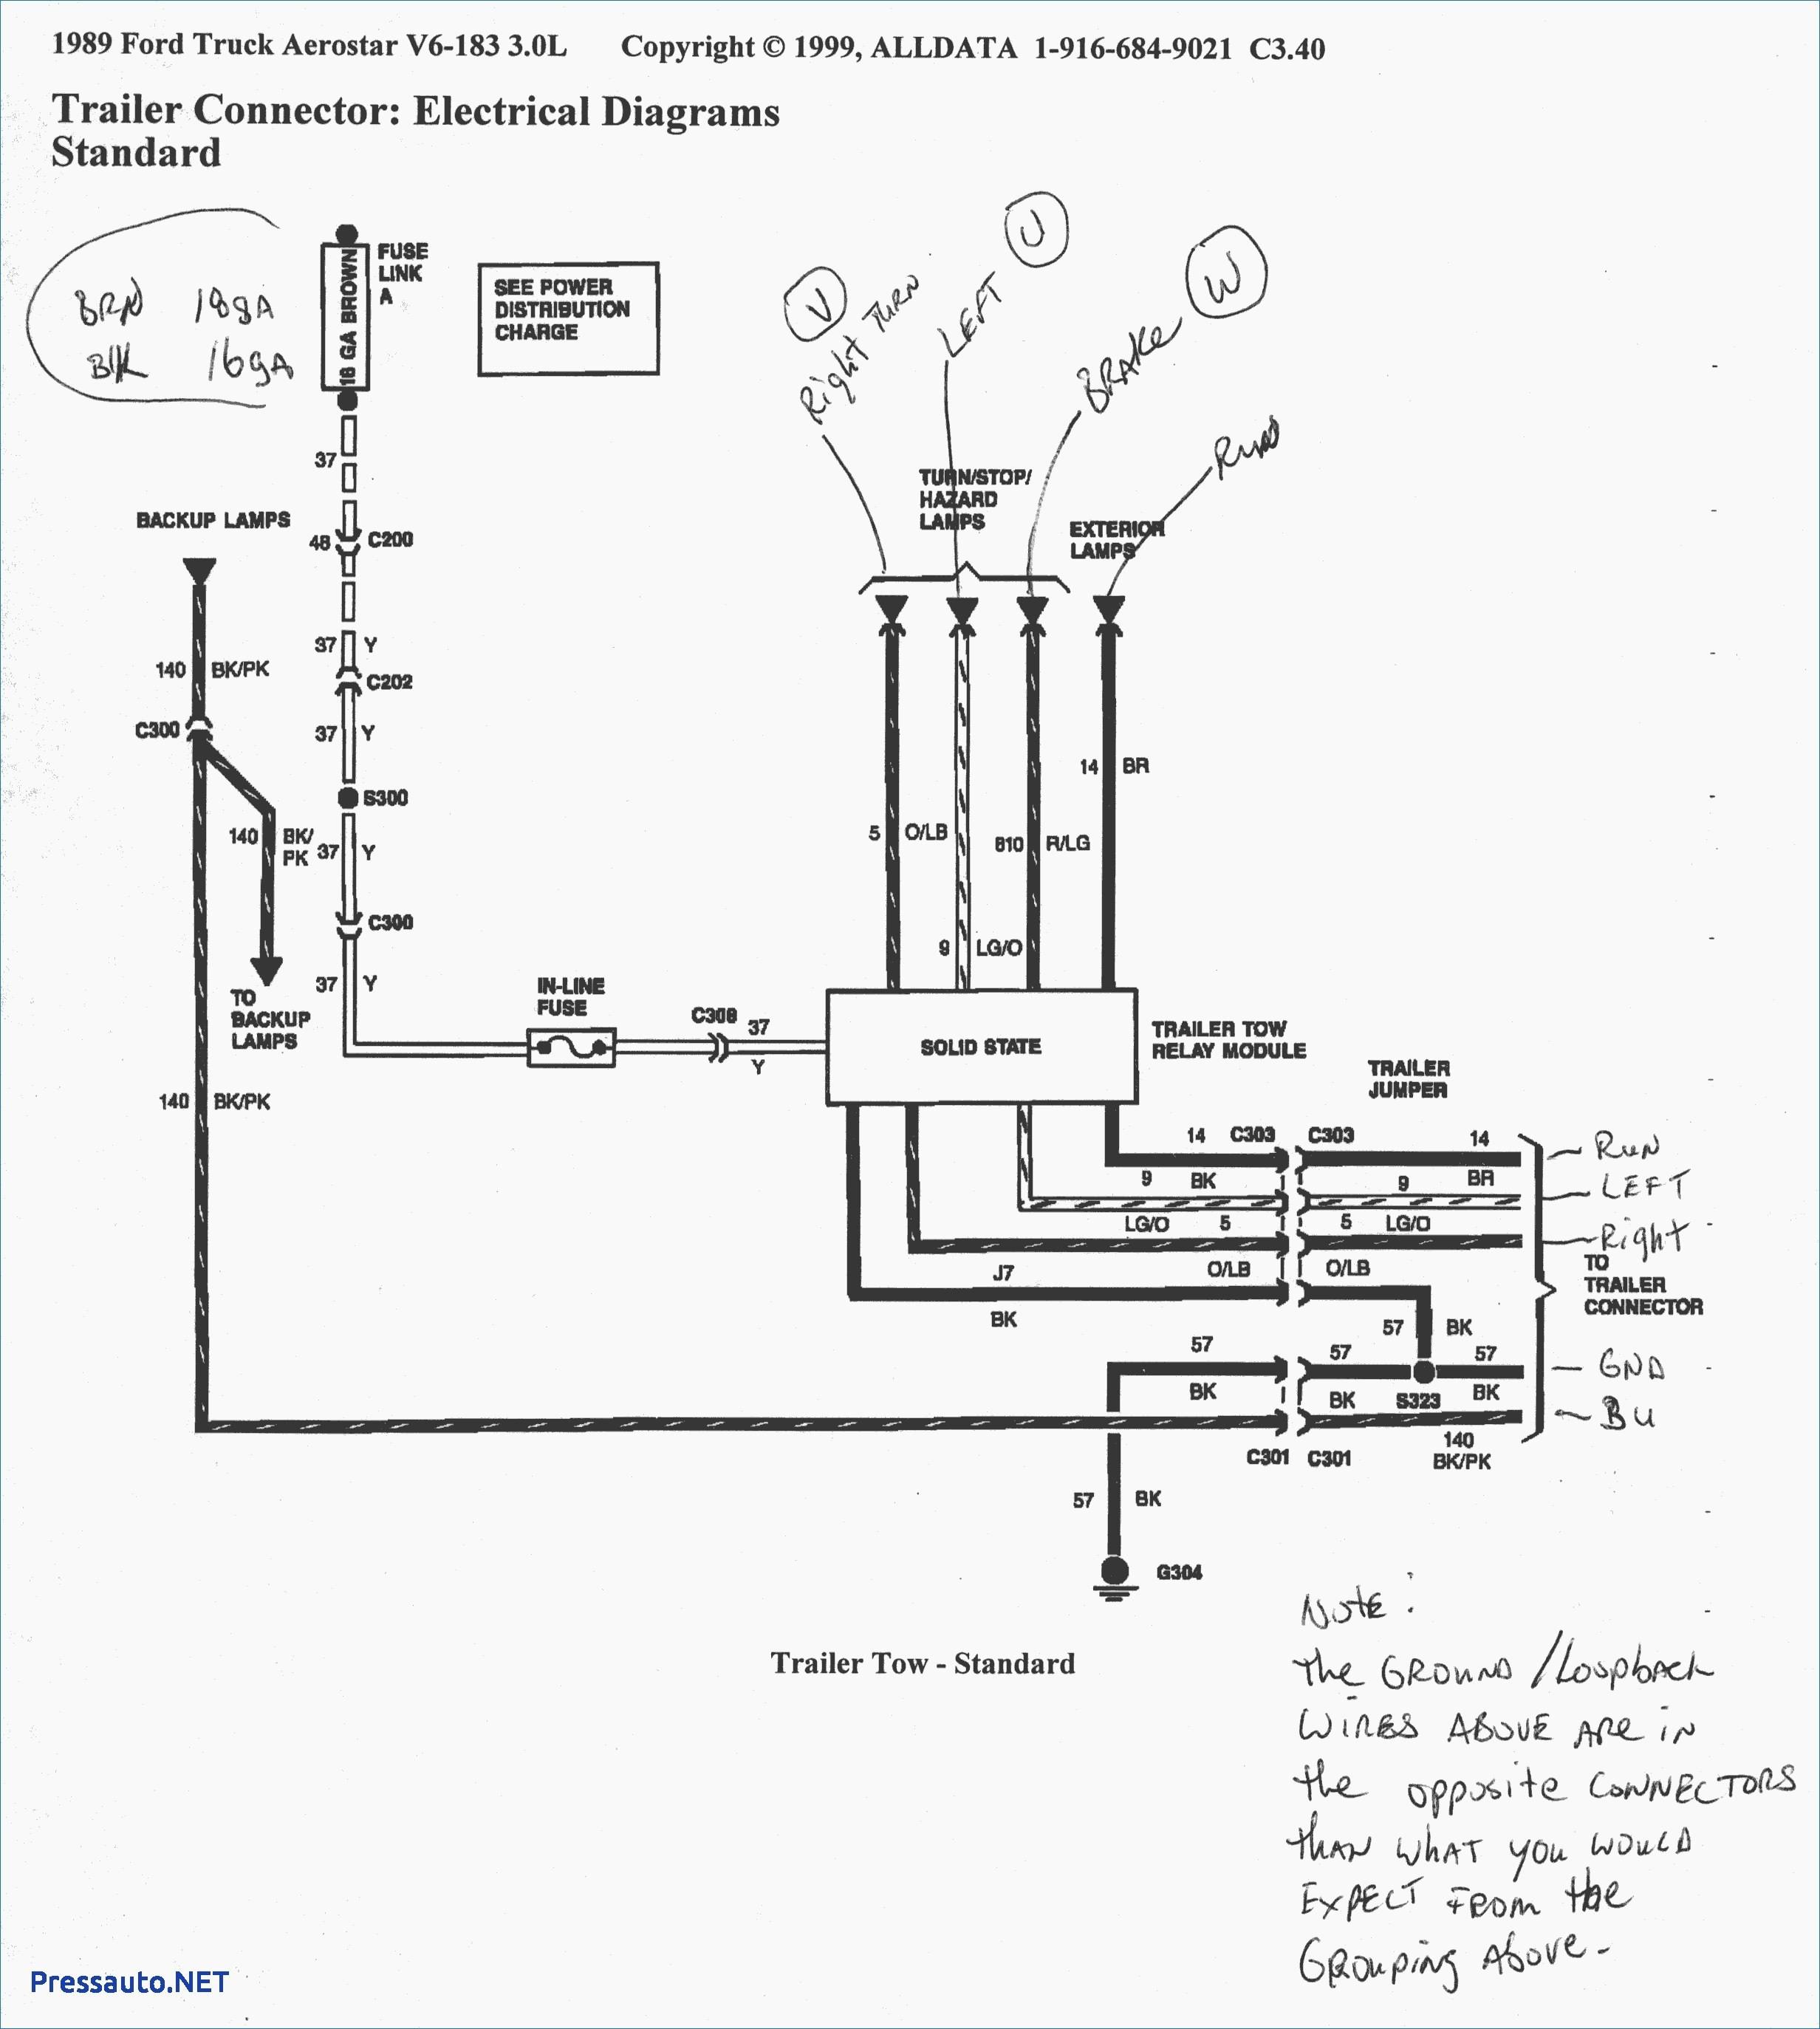 f150 trailer wiring diagram Download-ford f150 trailer wiring harness diagram Download Trailer Wiring Diagram Usa Save Inspirational Ford F150 DOWNLOAD Wiring Diagram 17-e